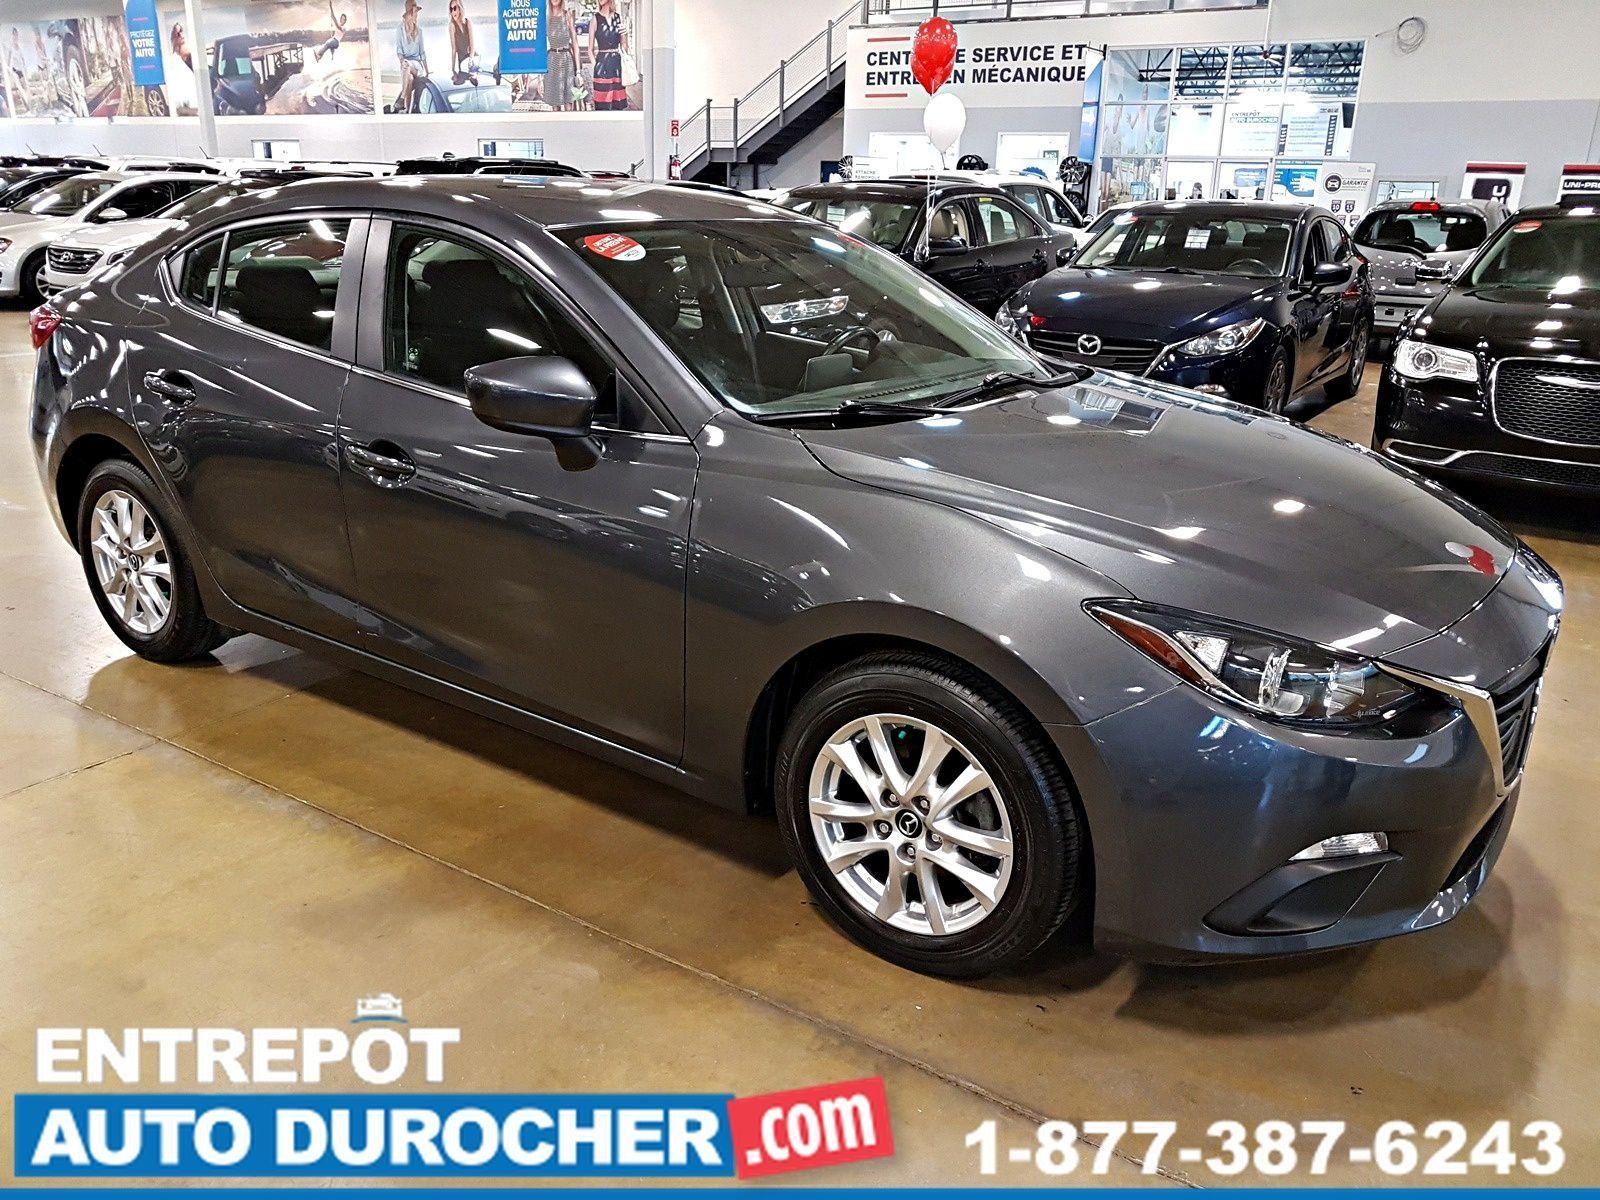 2014 Mazda Mazda3 GS-SKY Automatique - A/C - Caméra de Recul Heated Seats